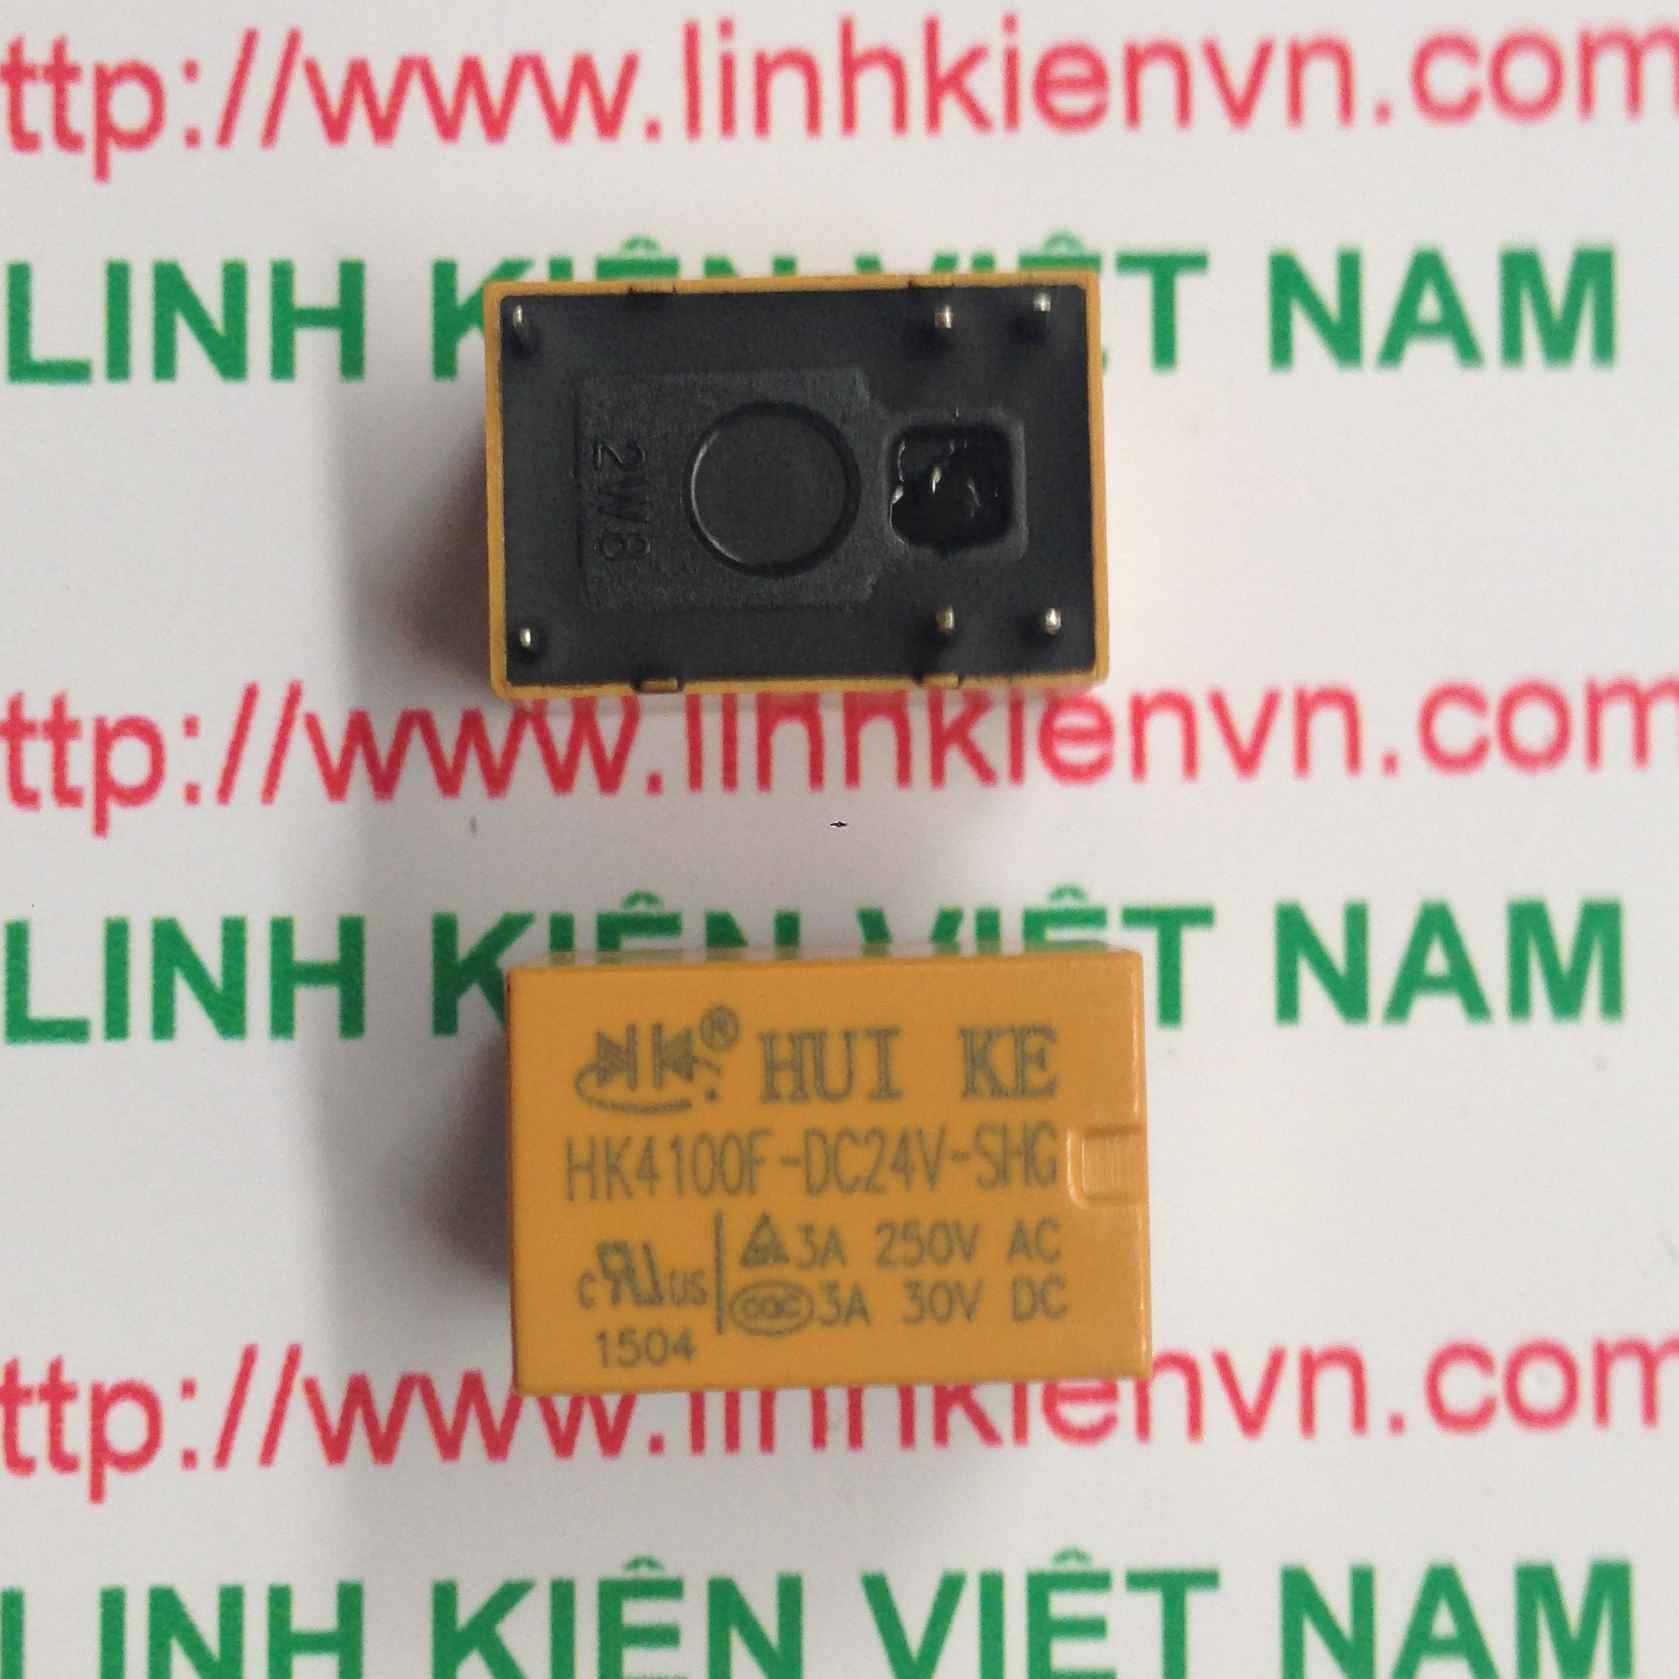 Relay Huike 1 cặp tiếp điểm 24V-3A | HK4100F-DC 24V-SHG - A1H13(KB4H3)